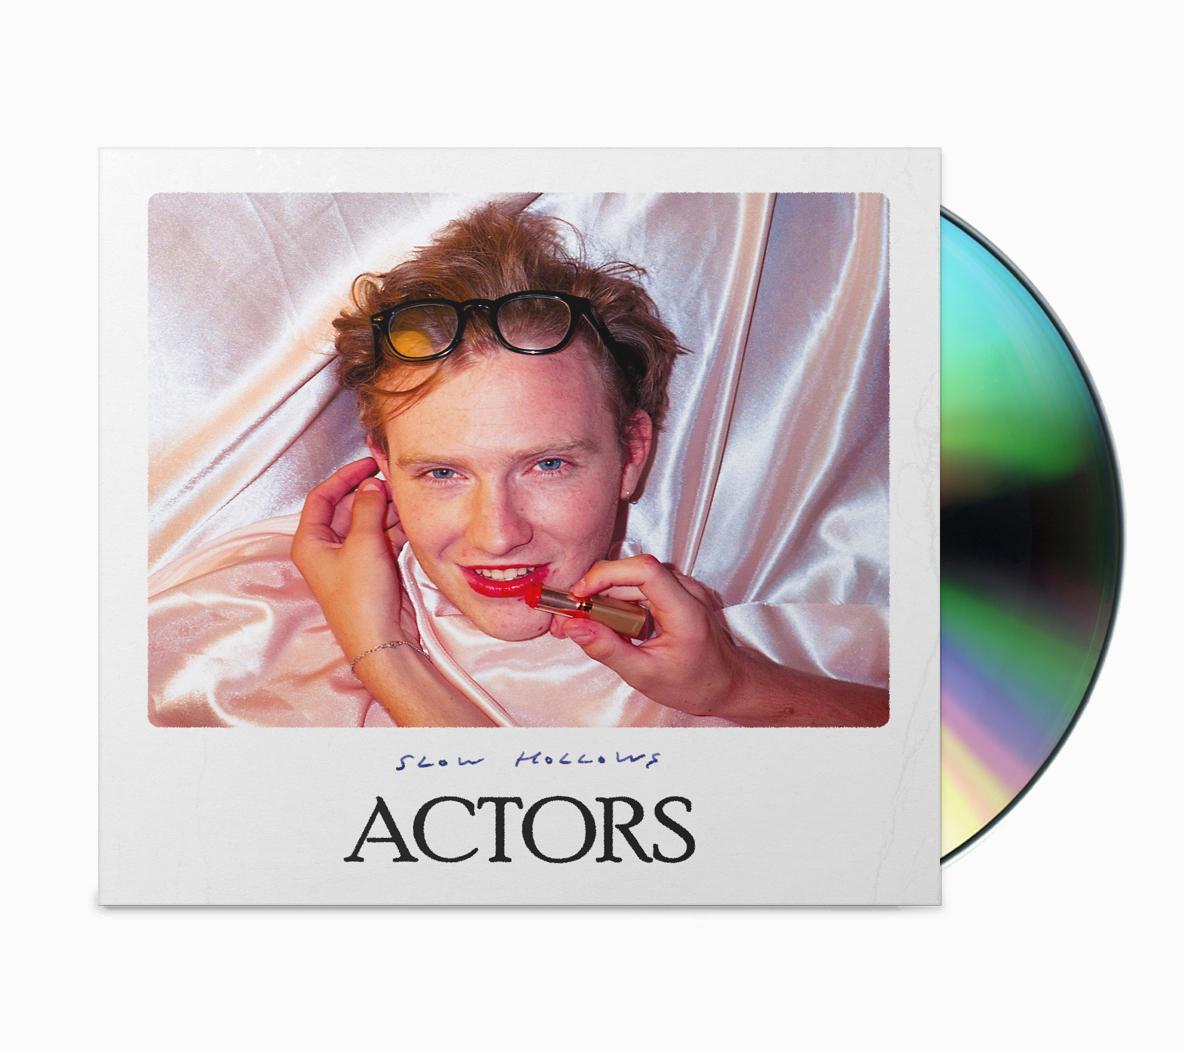 Slow Hollows - Actors